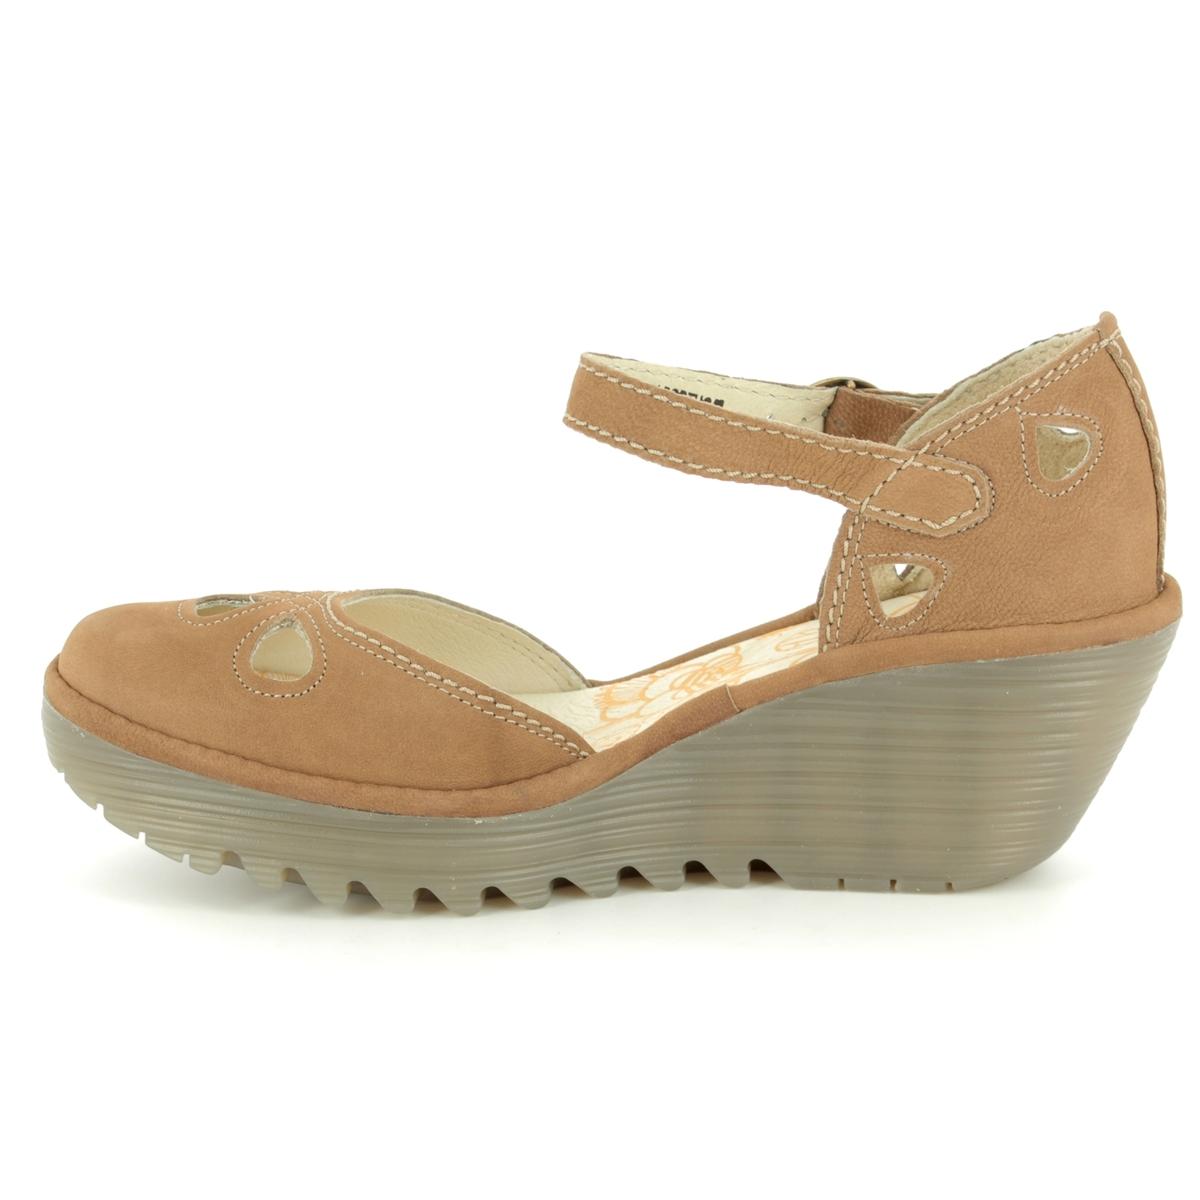 2dbc51095667b Fly London Yuna P500016-138 Tan Wedge Shoes